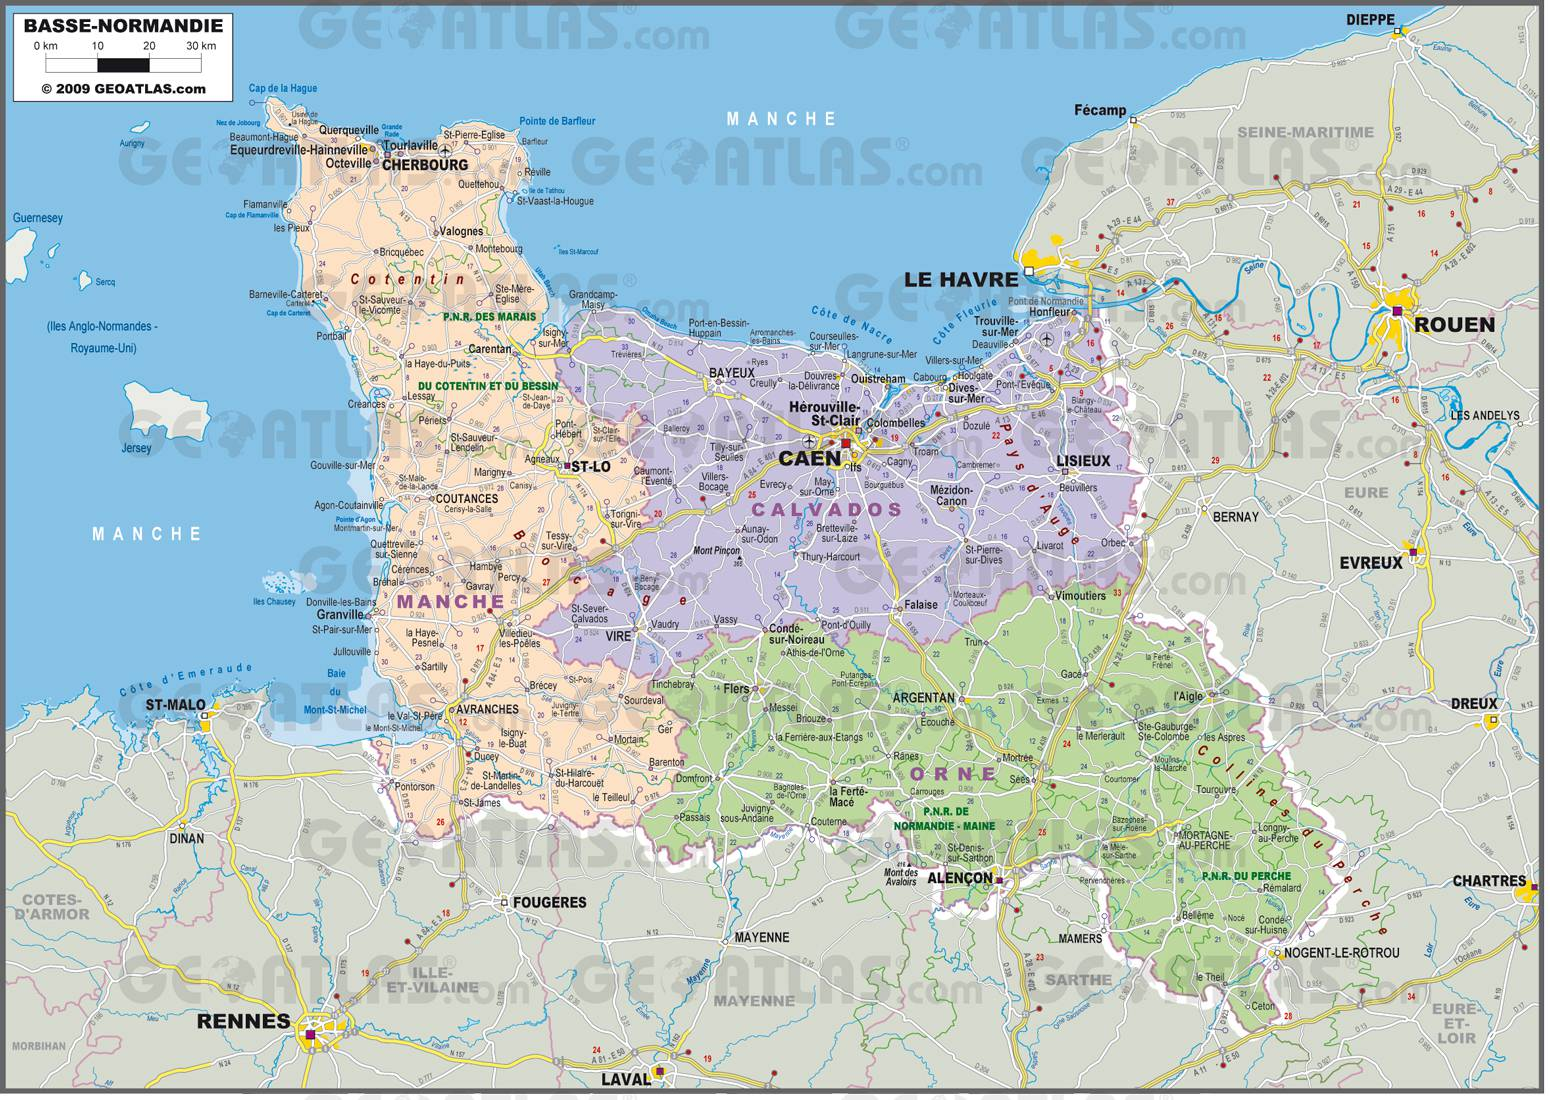 Carte administrative de la Basse-Normandie